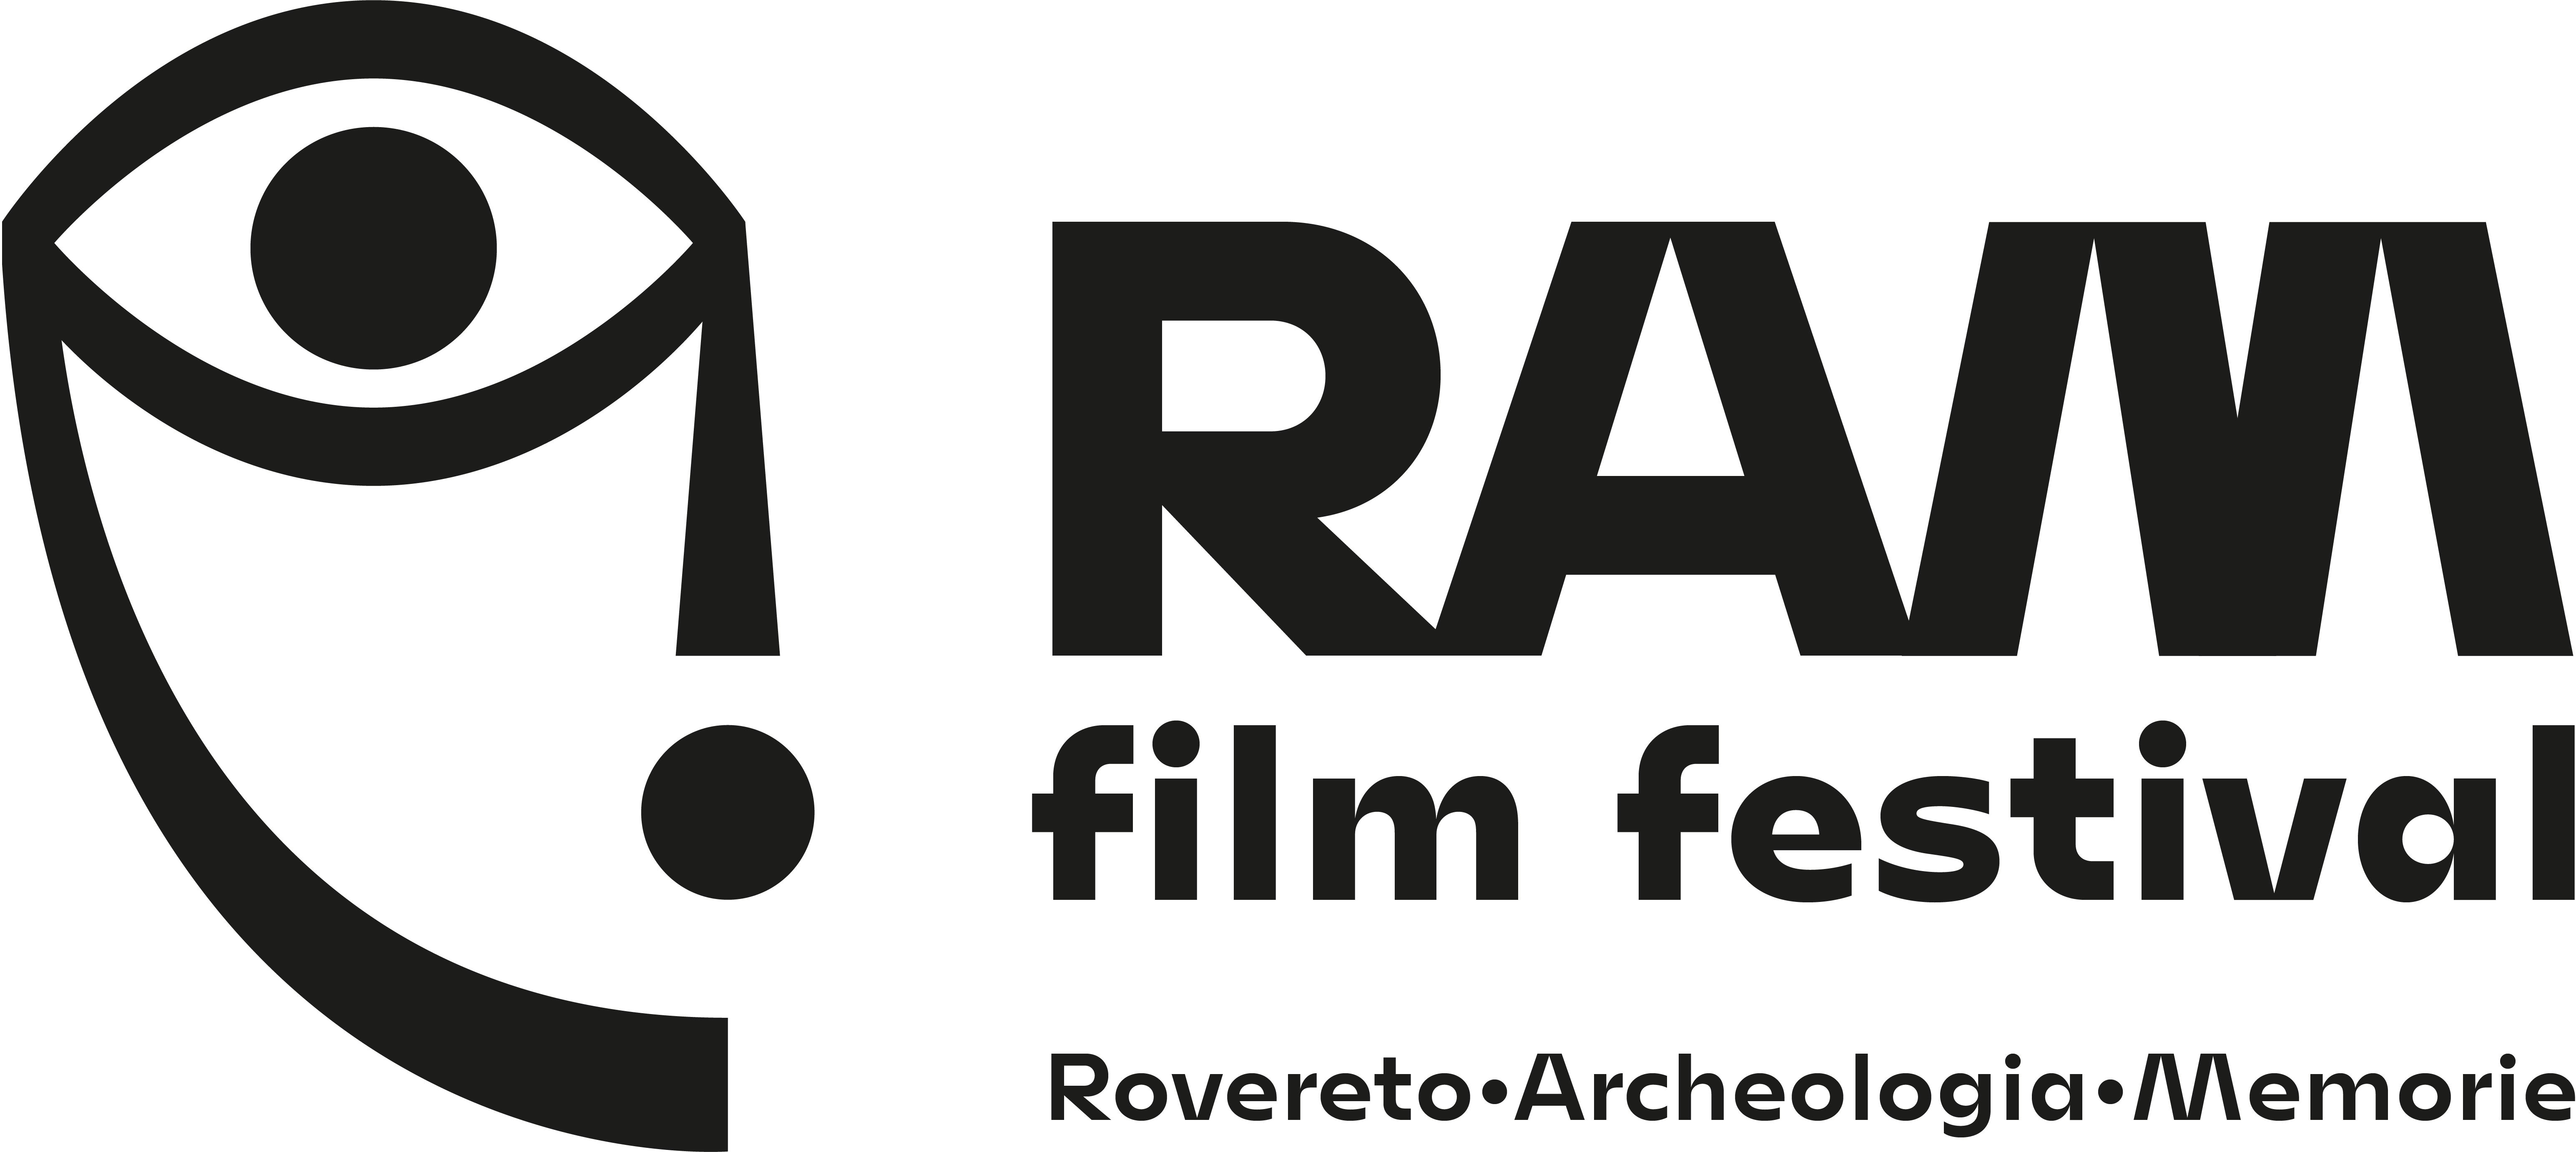 rovereto_ram-film-festival_logo-BN_foto-fmcr.jpg